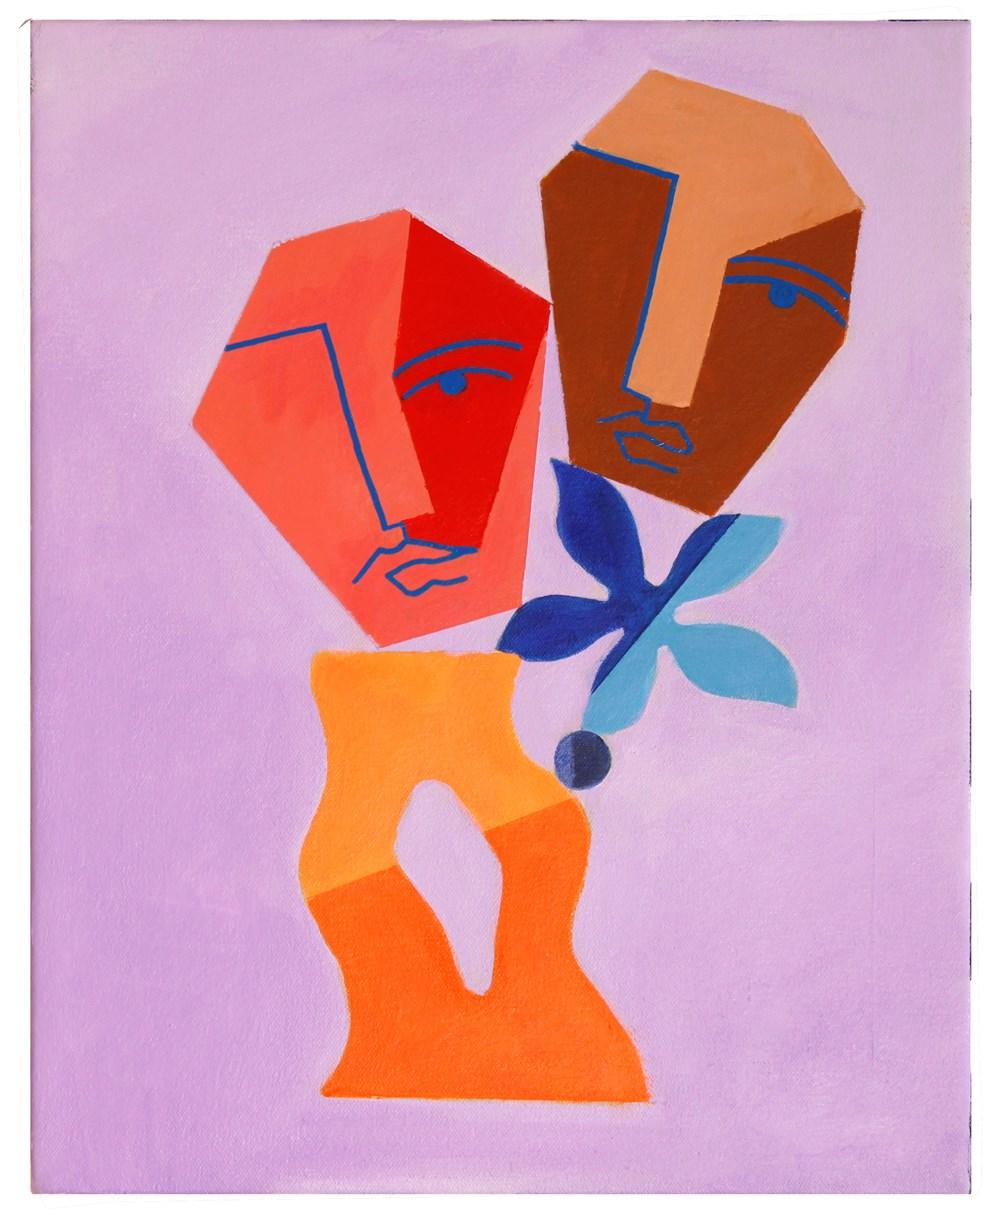 50 x £50 - Lot 34, Nicola Morland, Interdependence